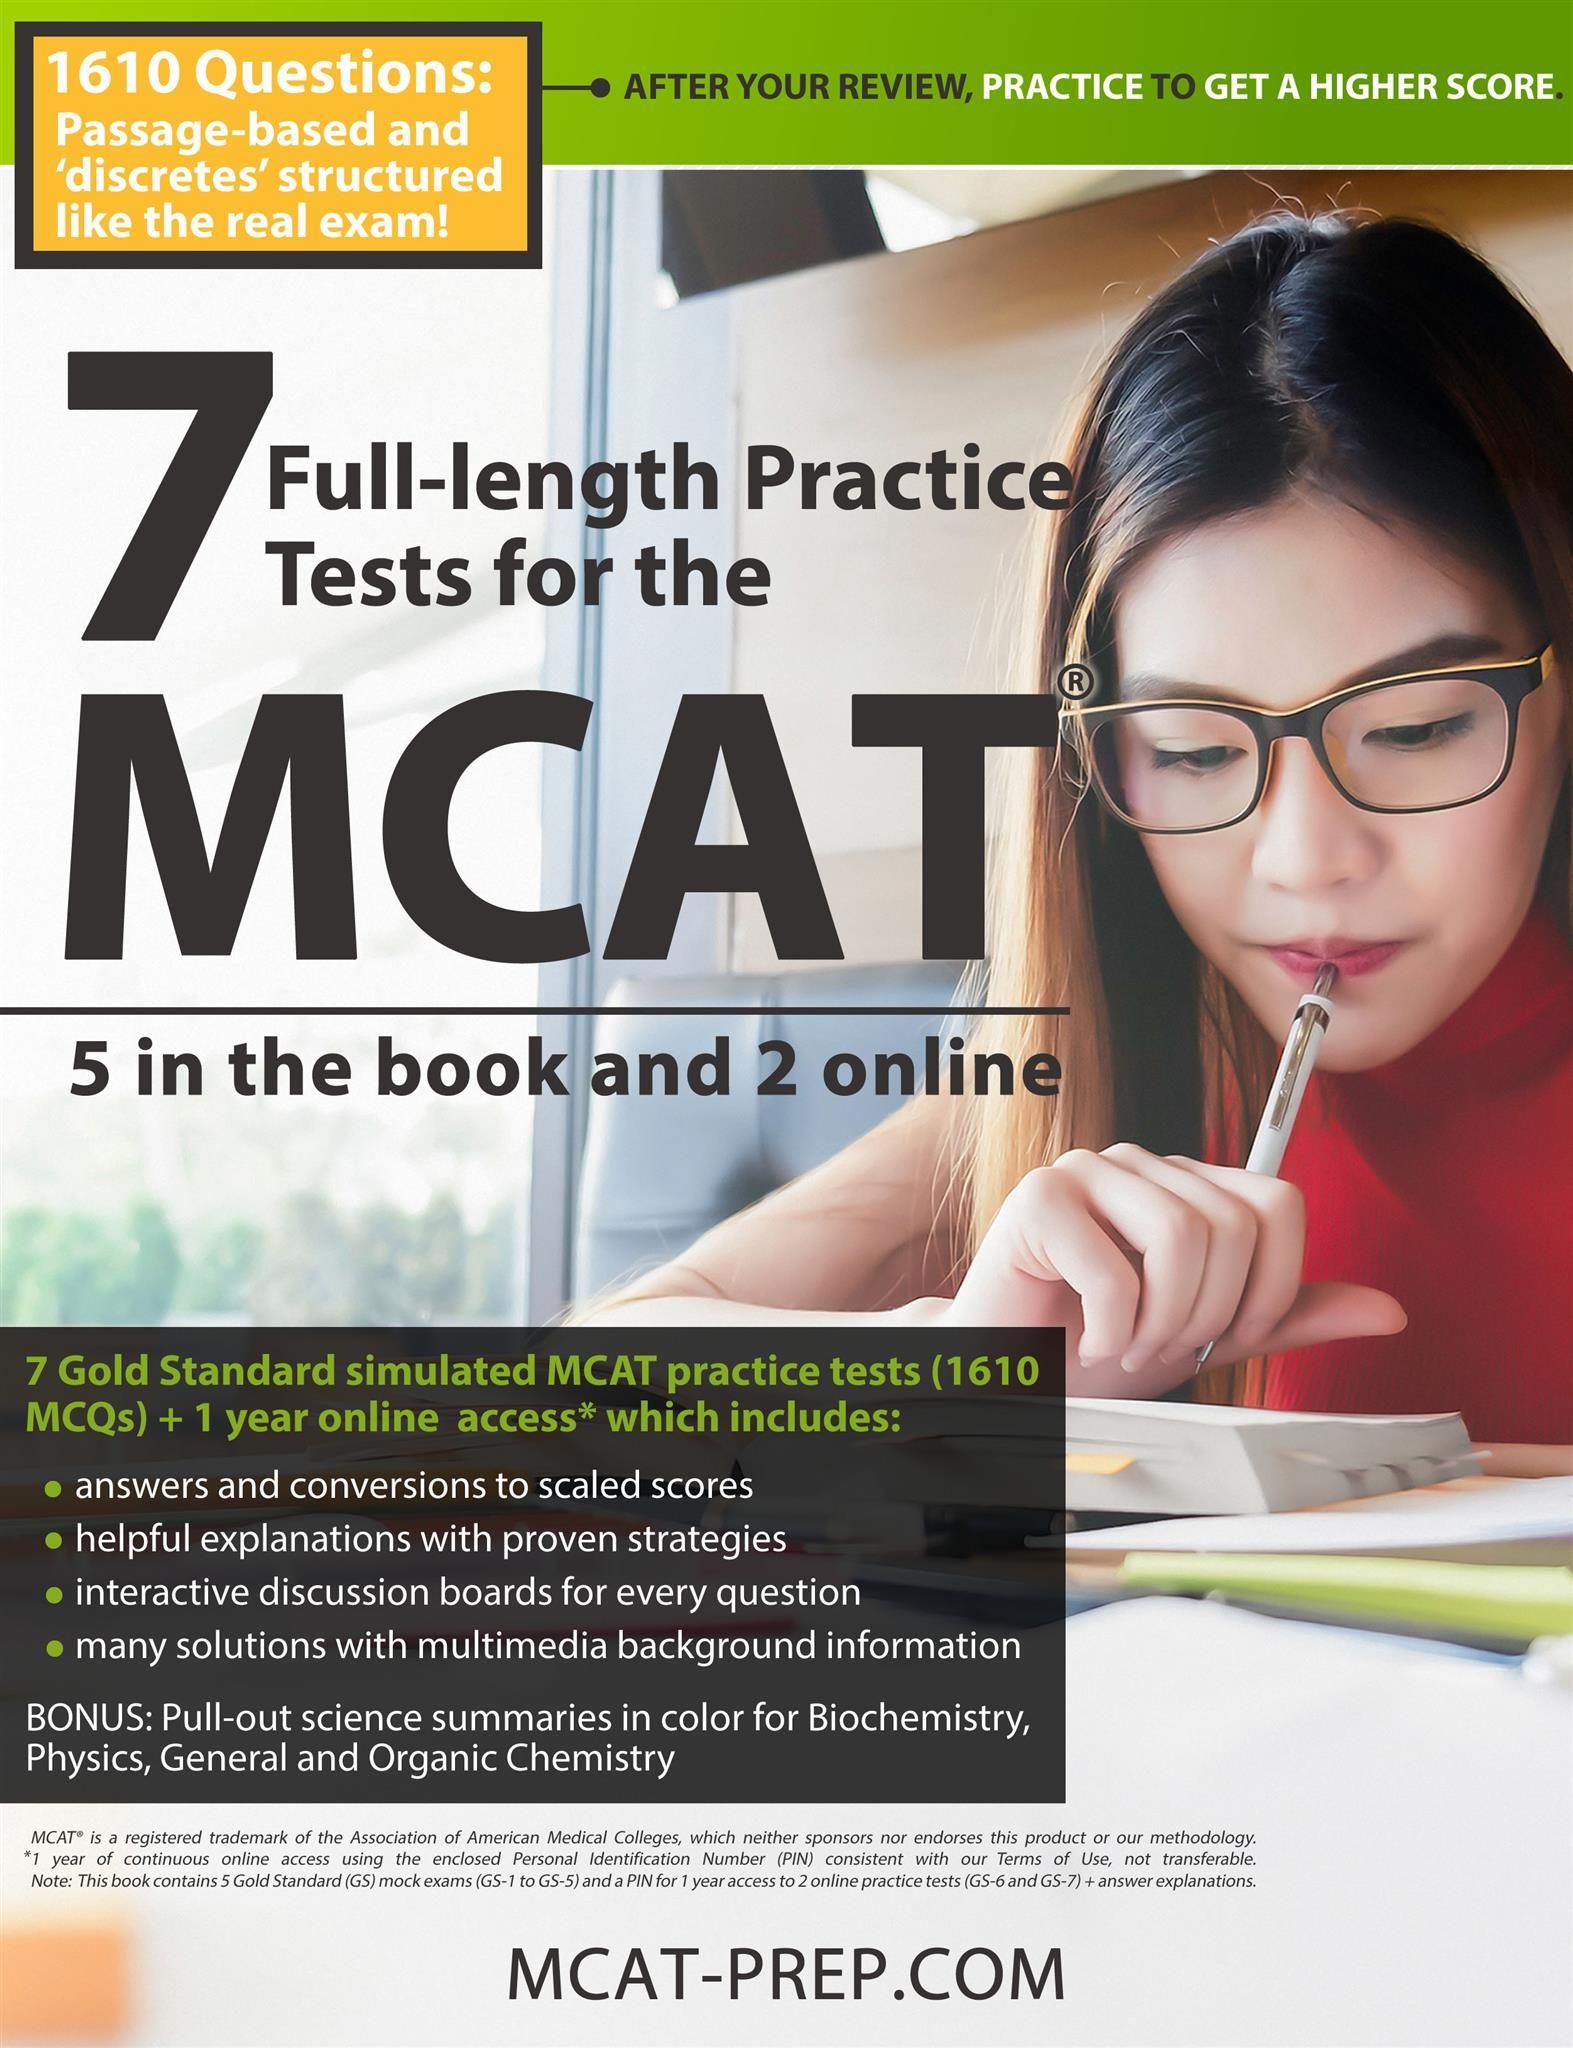 Gold Standard MCAT Guide 7 exams MCAT practice tests book